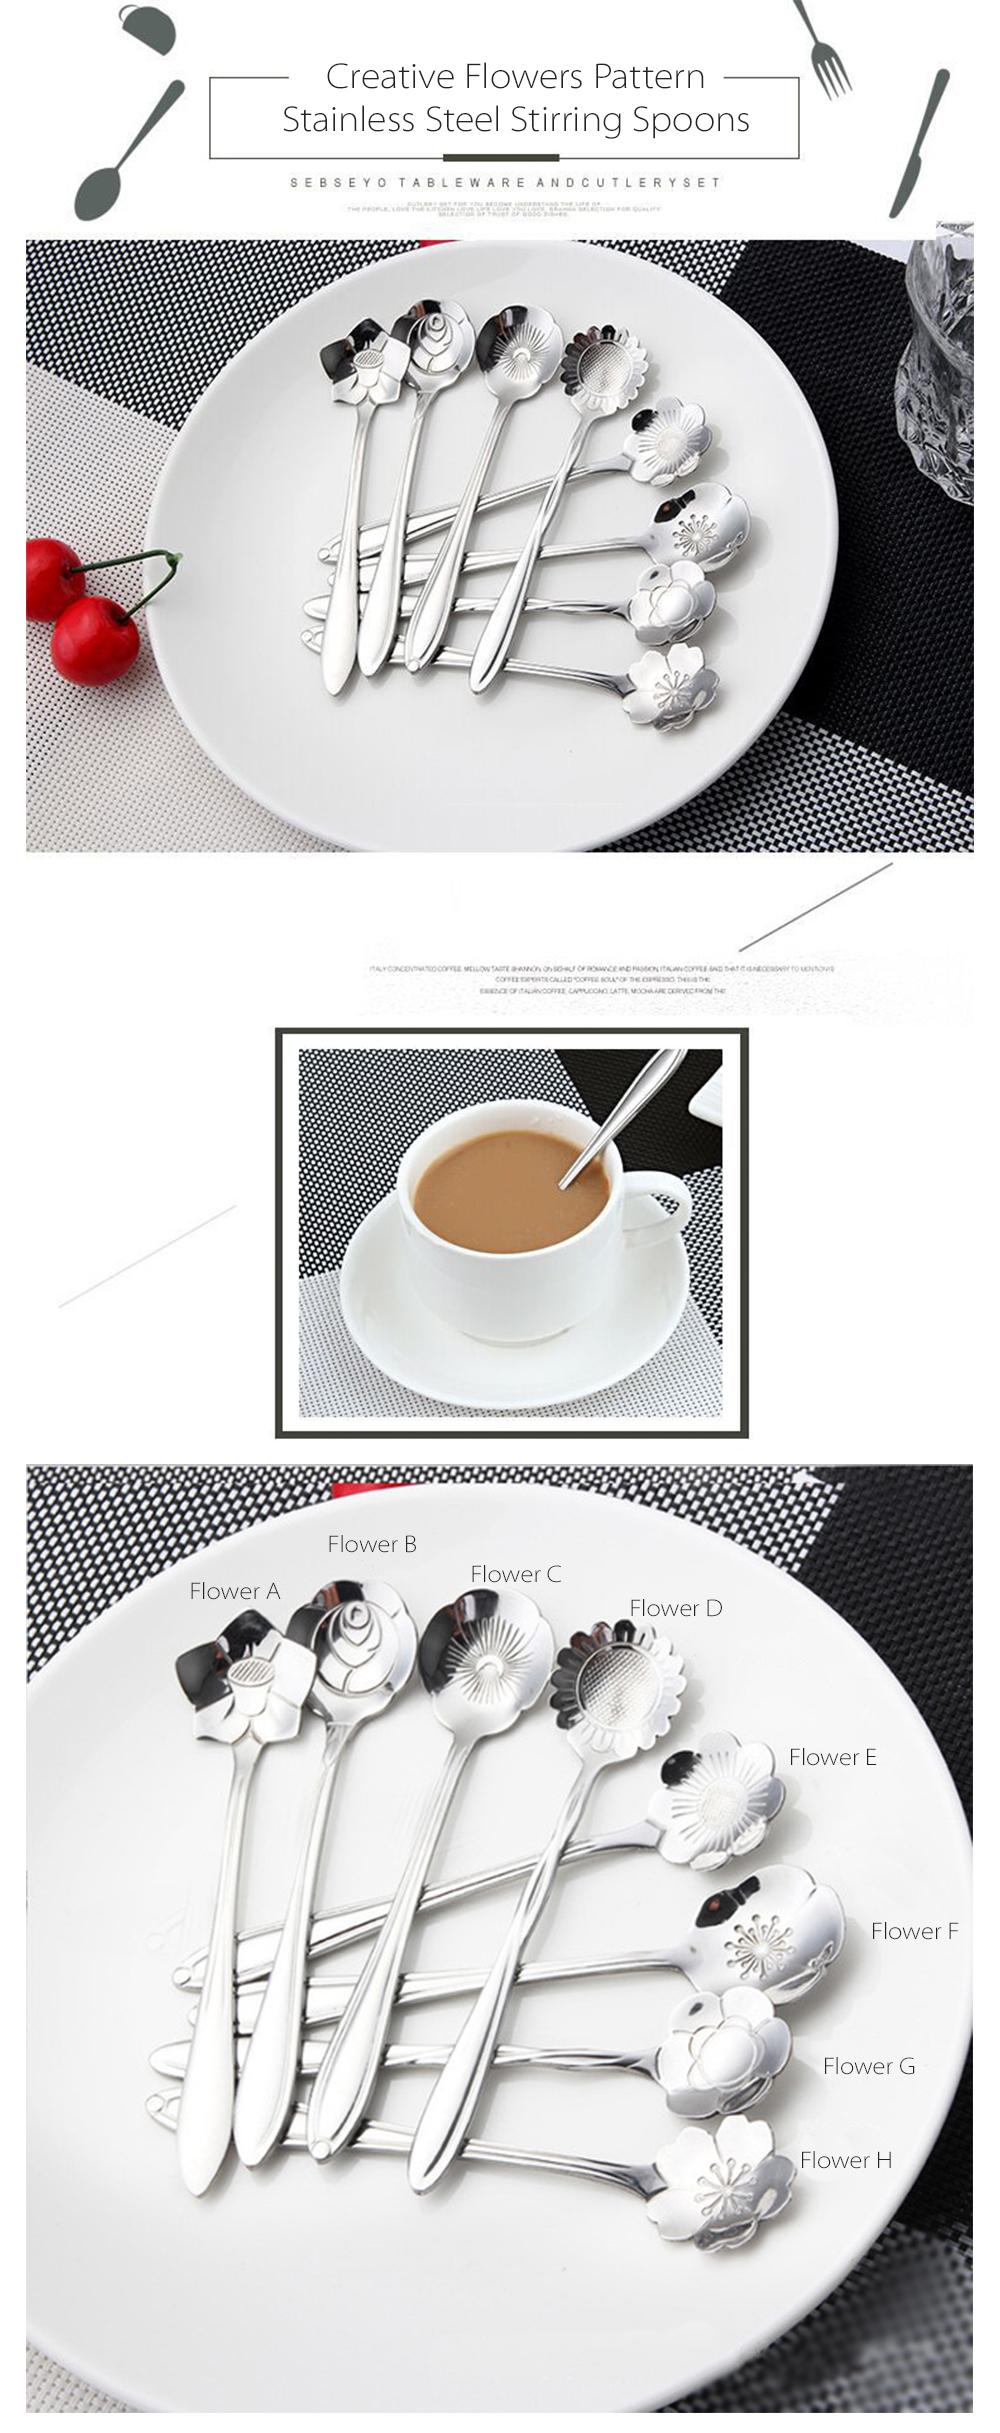 Creative Spoon Set Choose Your Favorite Pattern